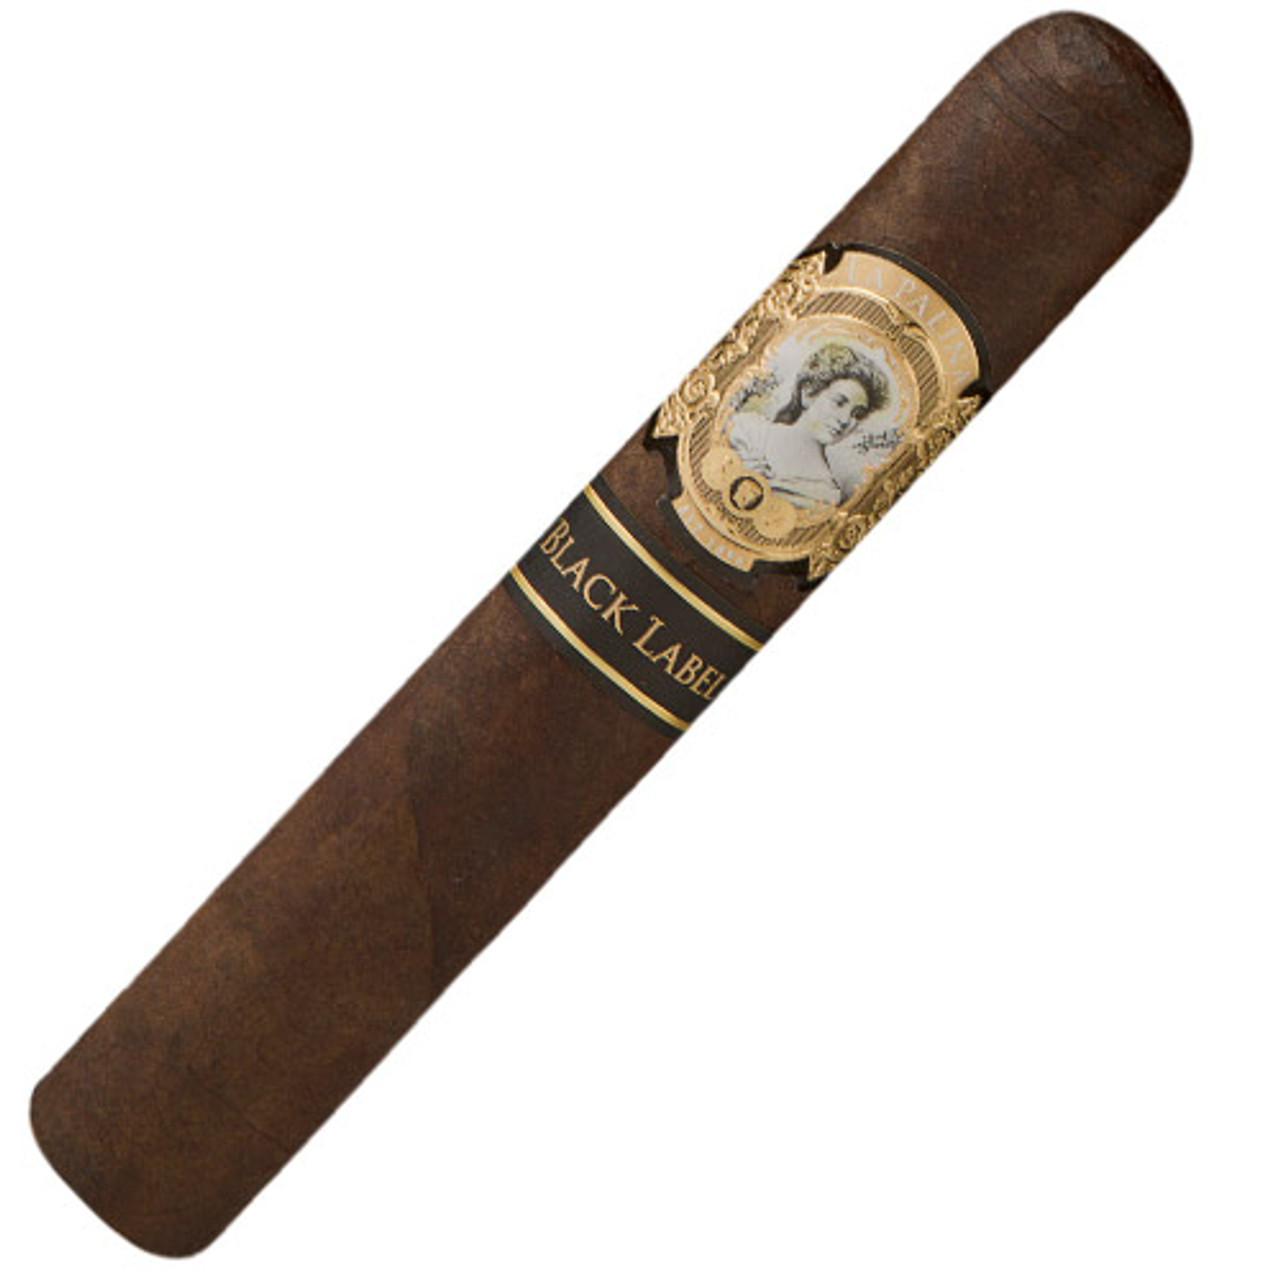 La Palina Black Label Robusto Cigars - 5 x 52 (Box of 20)